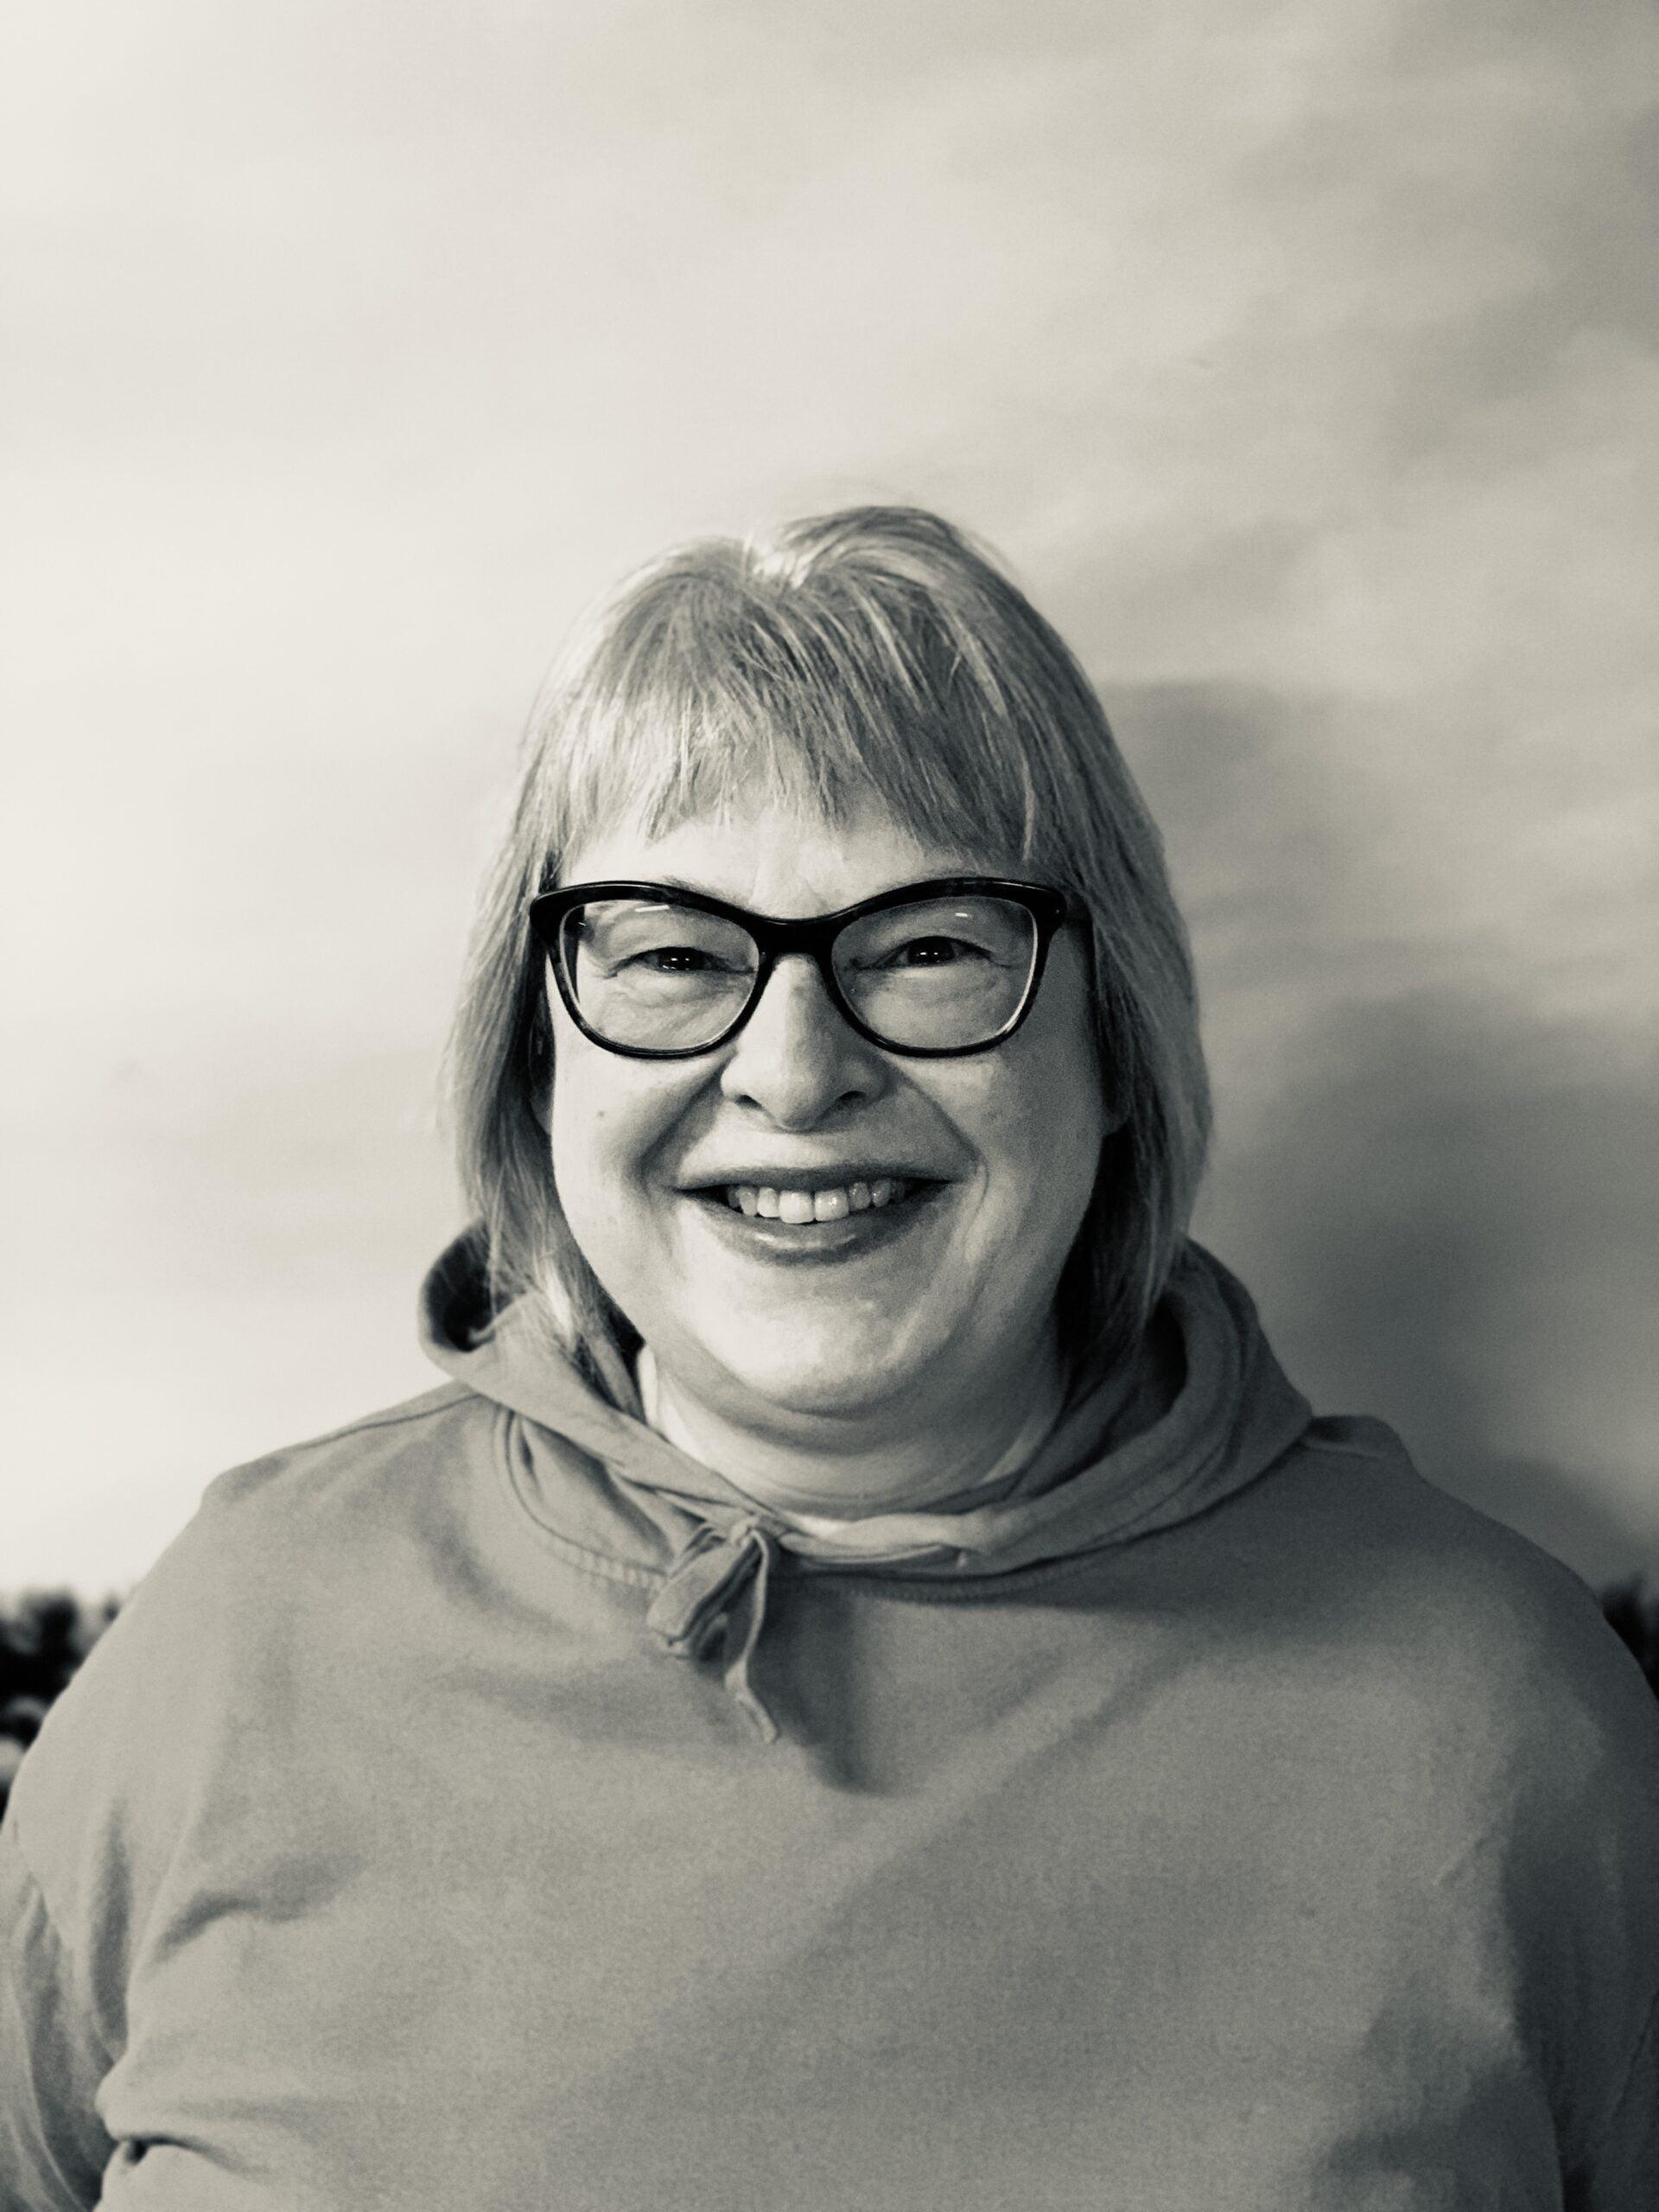 Lena Skogberg